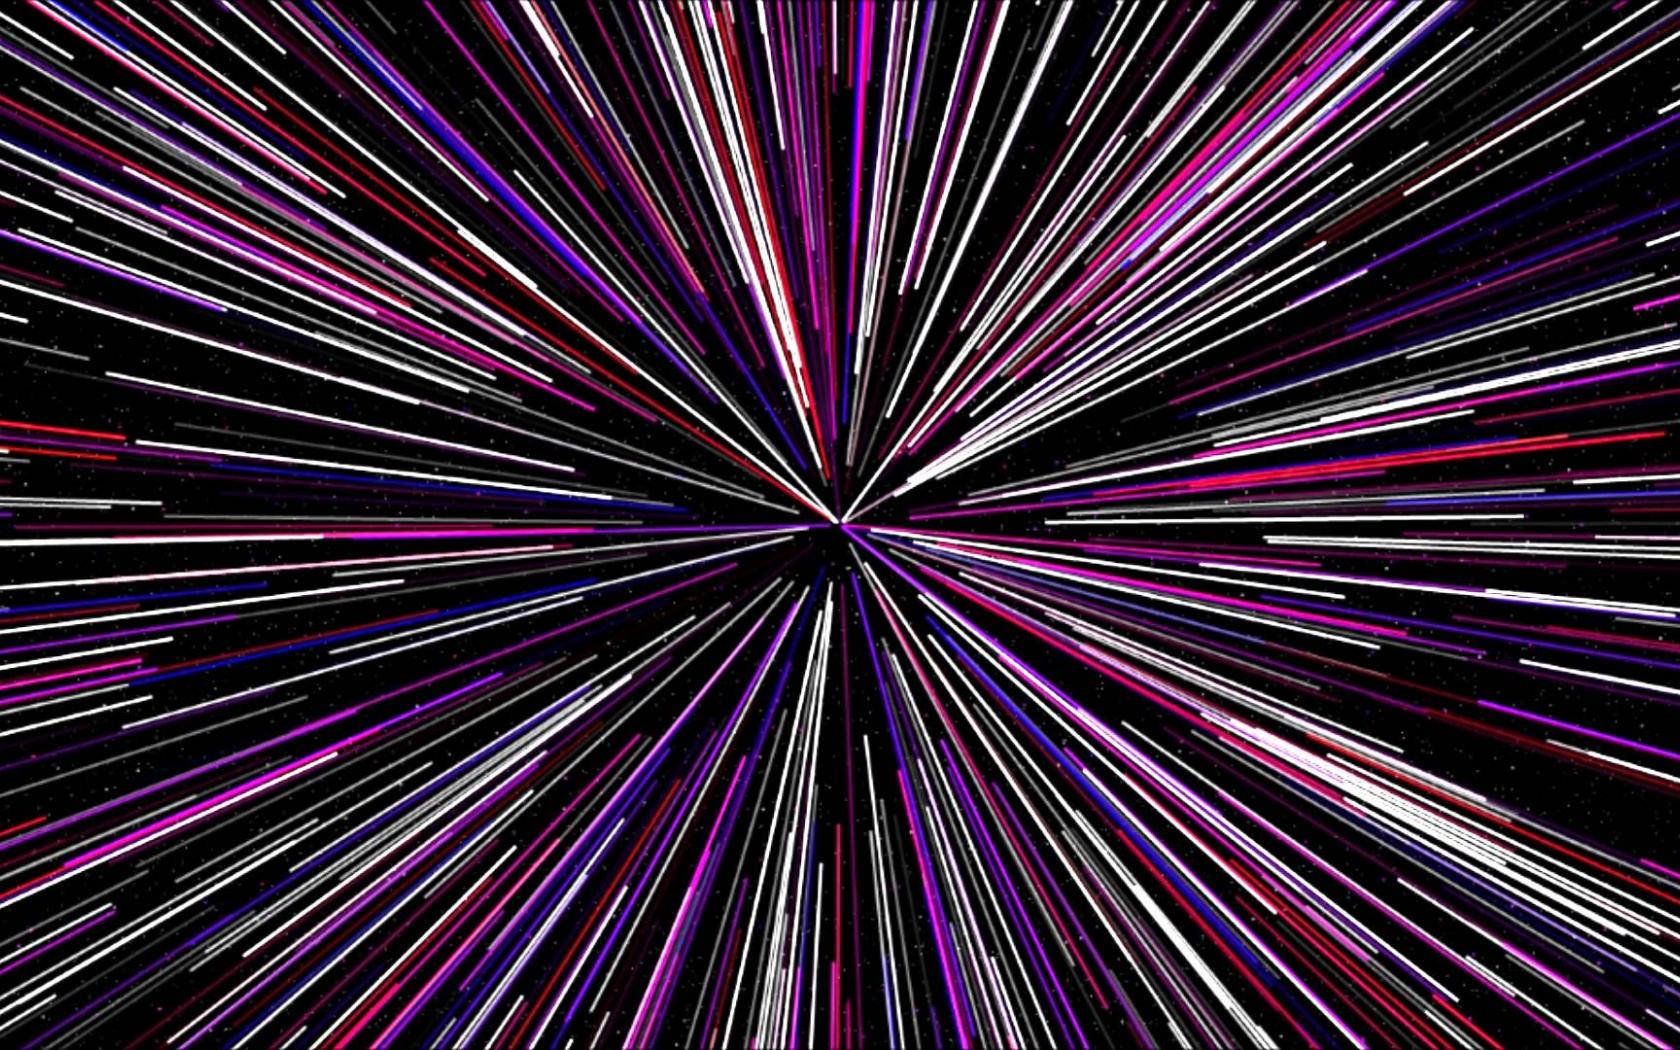 Free Download Jump To Lightspeed Star Wars In Color Jump To Warp Star Trek Cool 1920x1080 For Your Desktop Mobile Tablet Explore 50 Star Wars Gmail Wallpaper Star Wars